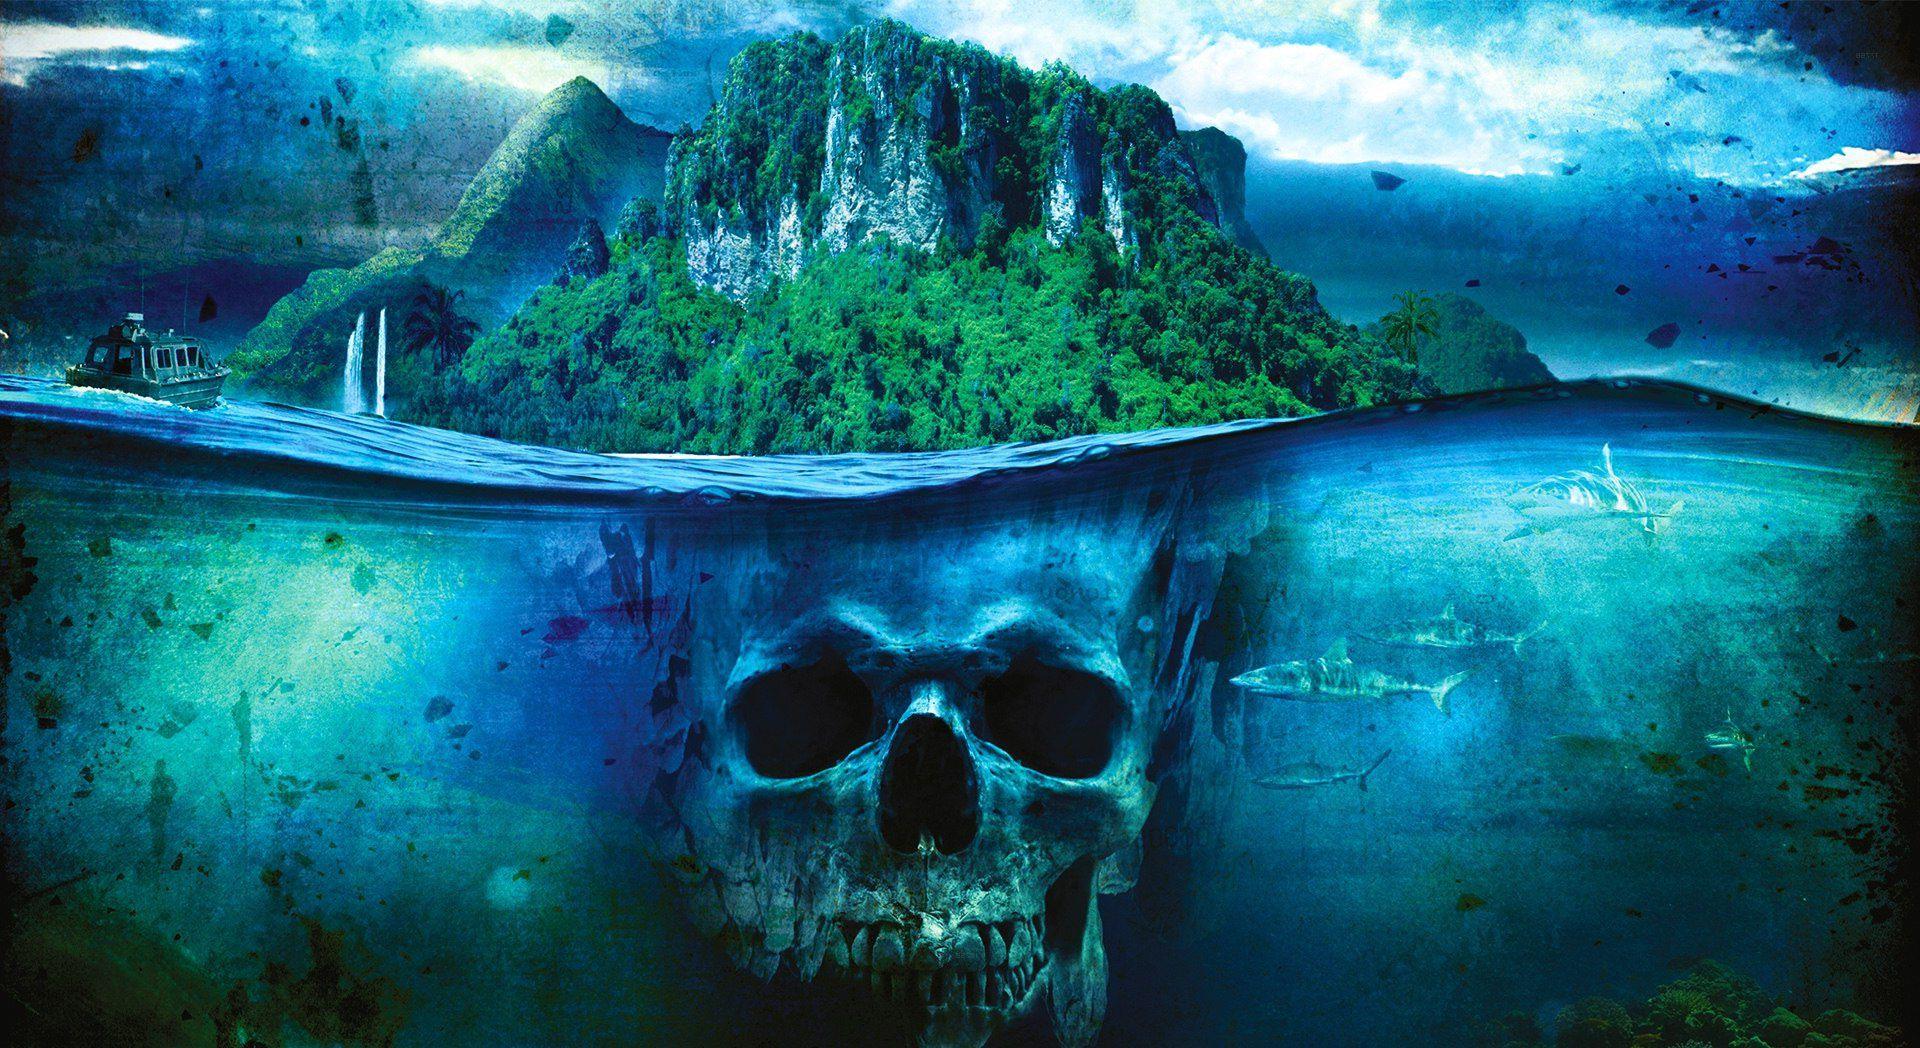 Far Cry 3 Amazing Graphic Skull Island Hd Wallpapers Jpg 1920 1048